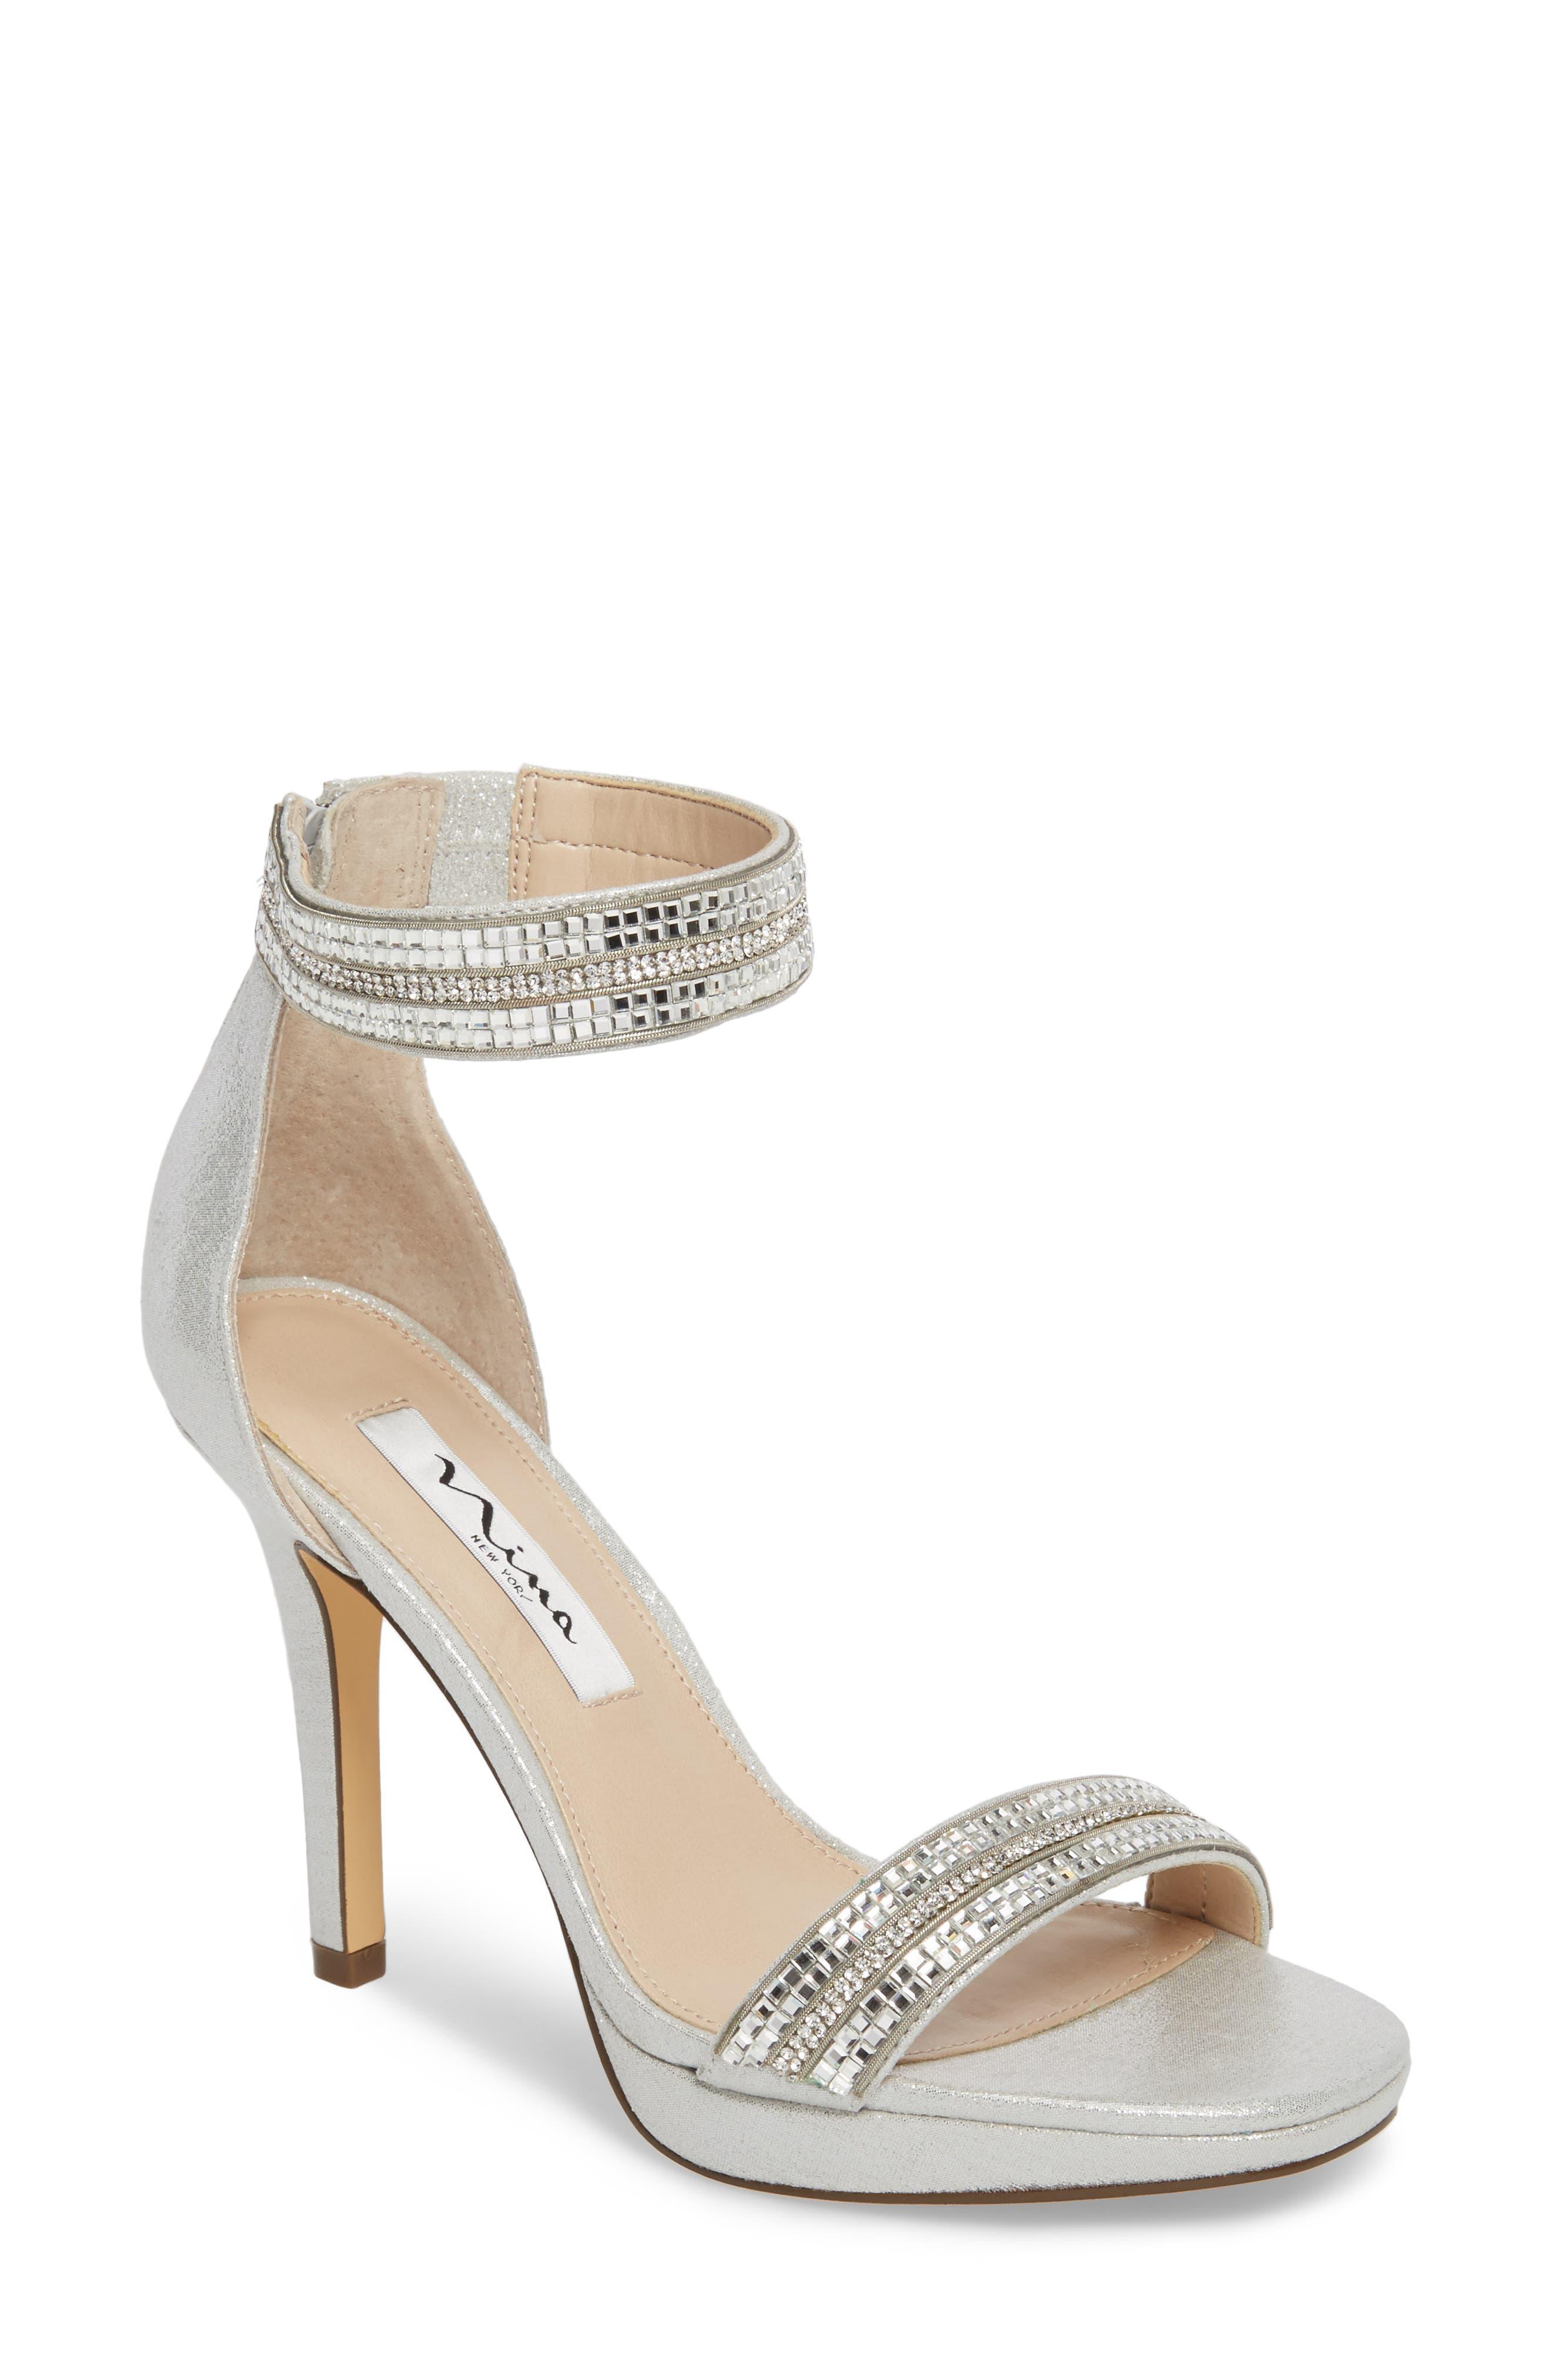 Main Image - Nina Aubrie Ankle Strap Sandal (Women)